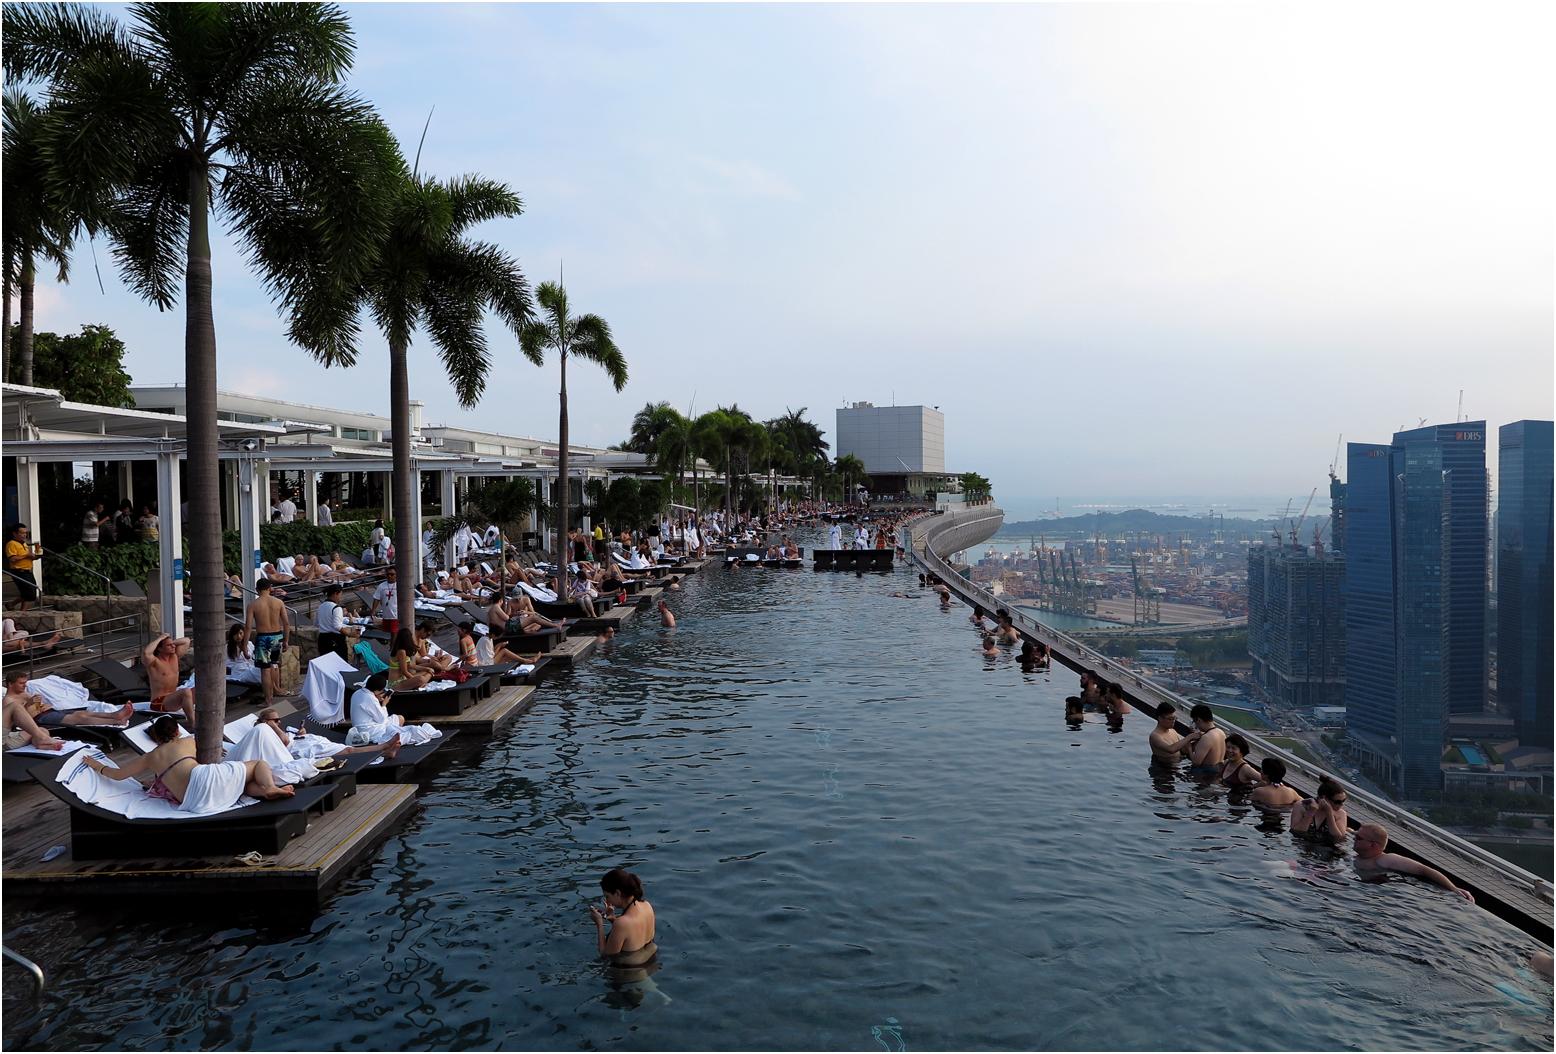 infinity pool marina bay sands singapur foto bild asia singapore southeast asia bilder. Black Bedroom Furniture Sets. Home Design Ideas